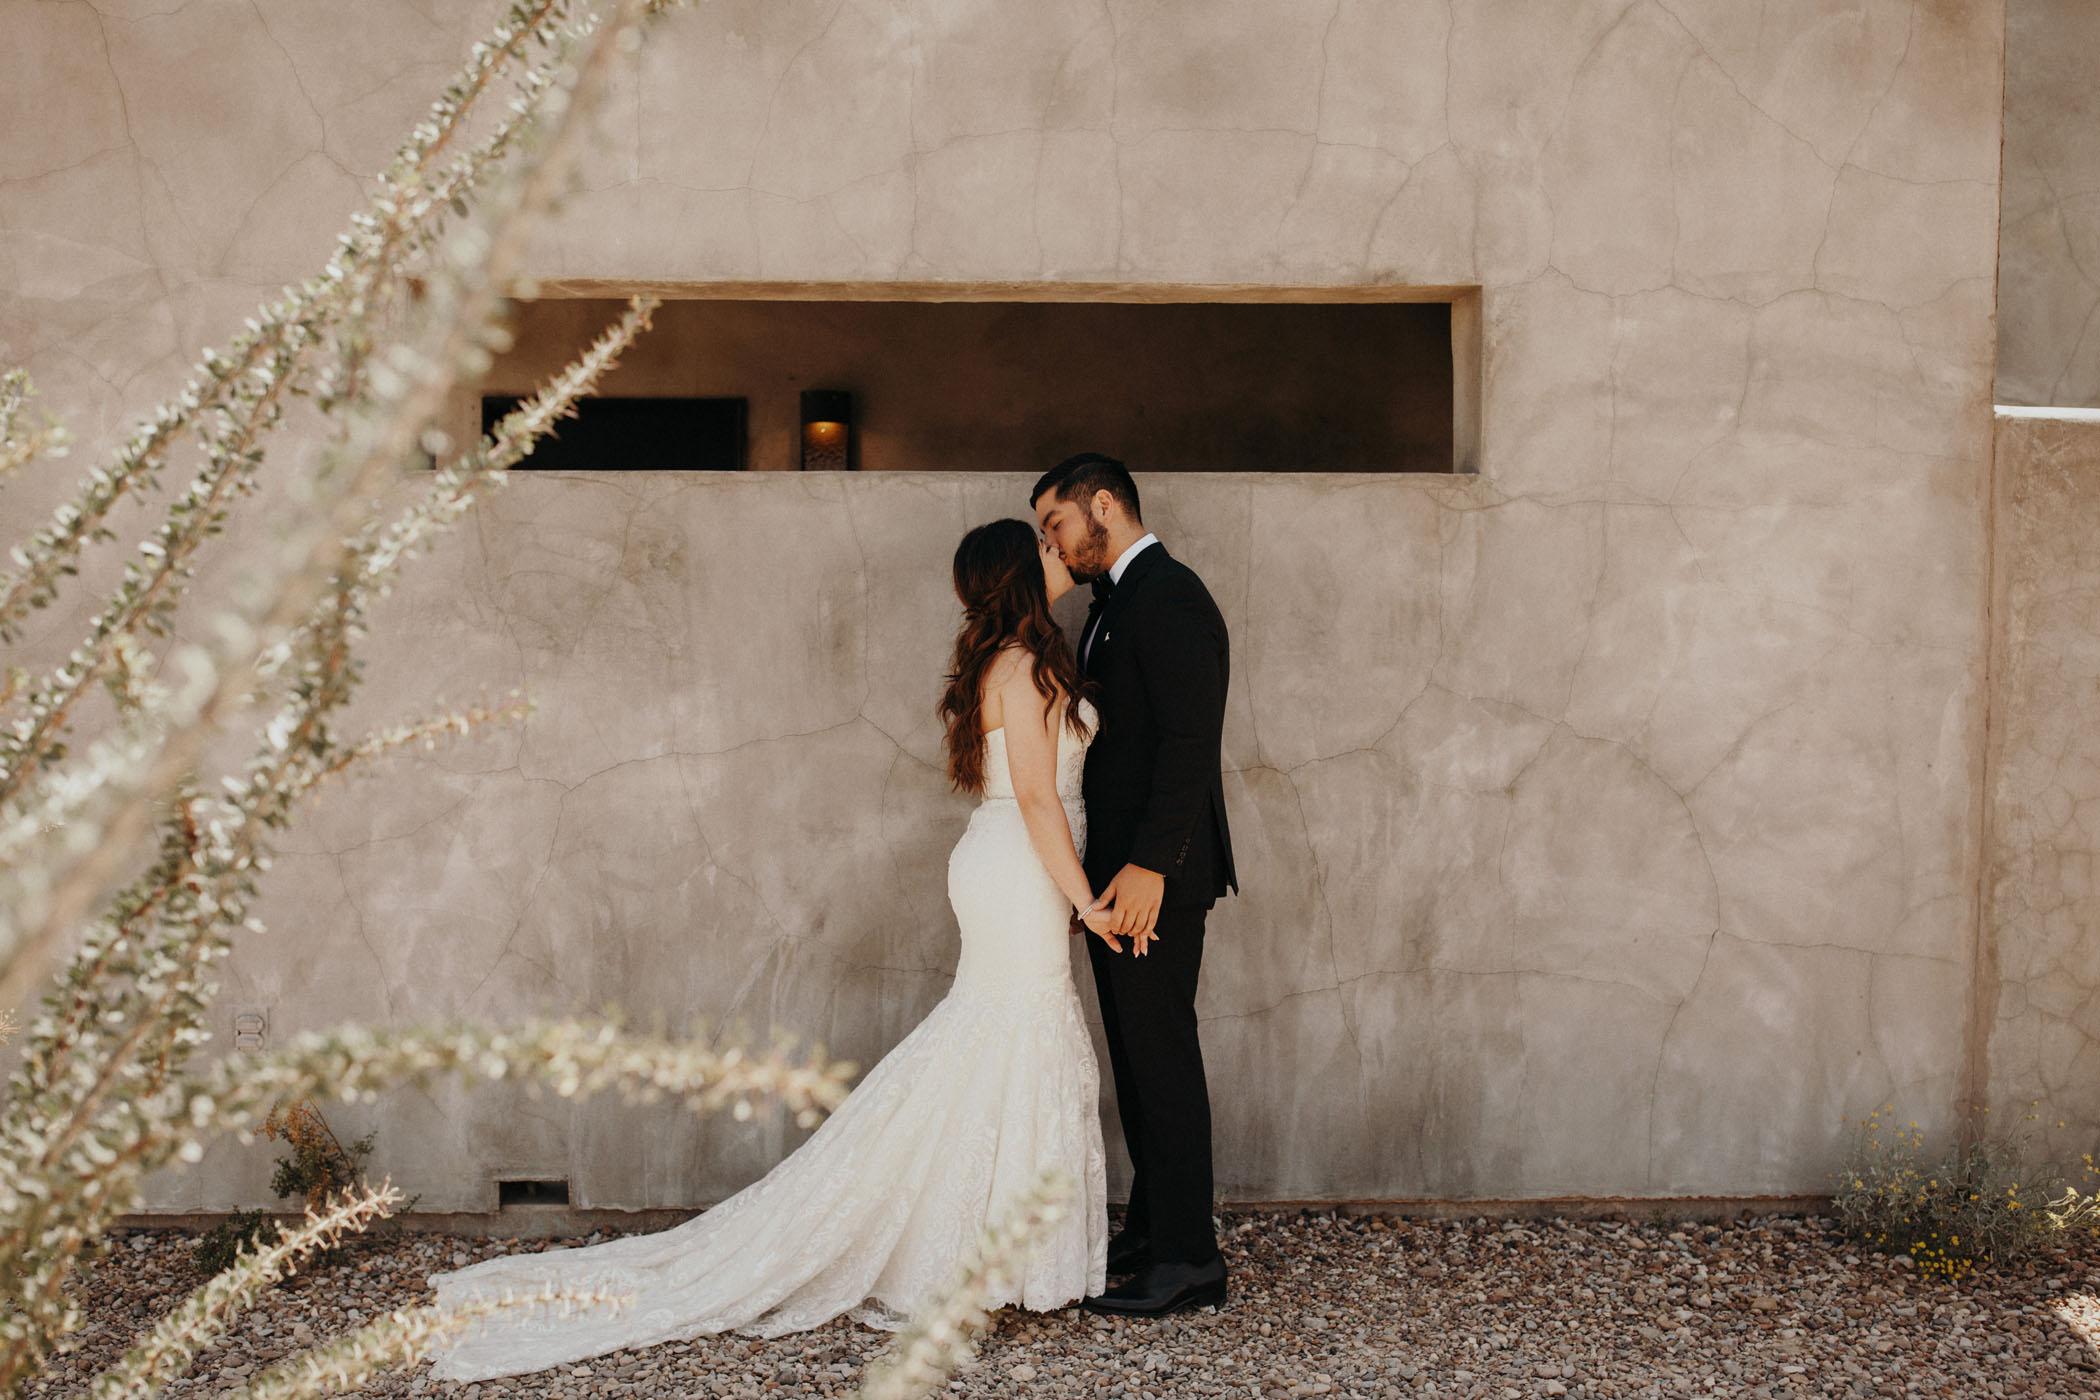 Desert Micro Wedding in Terlingua, Texas